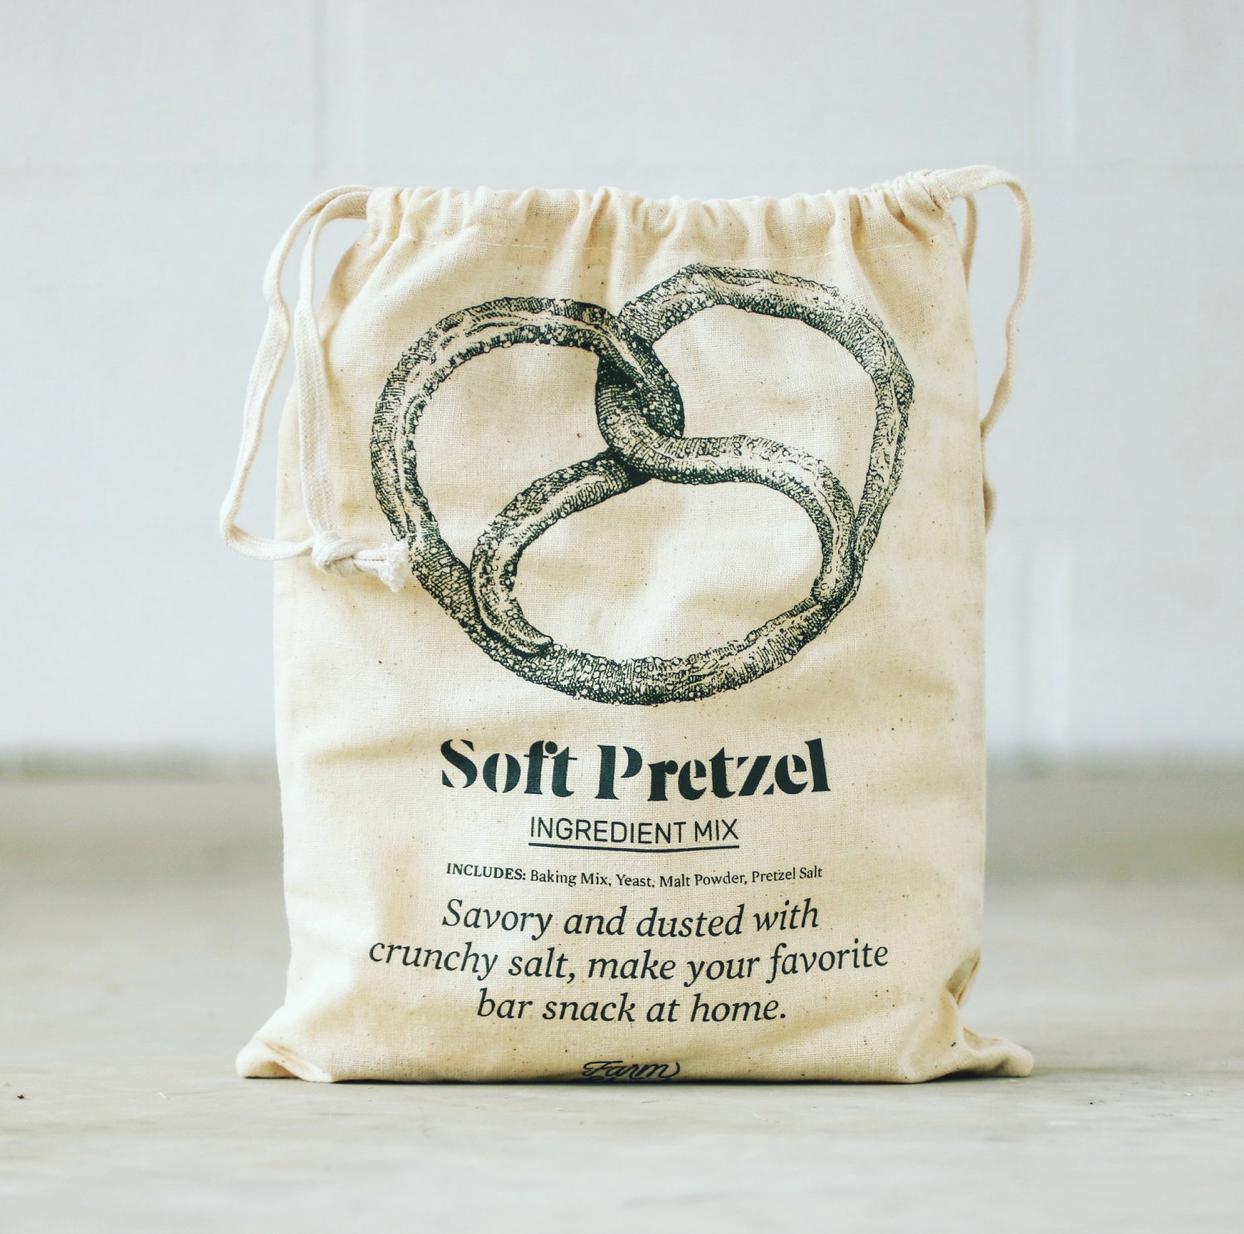 FarmSteady Soft Pretzel Making Mix